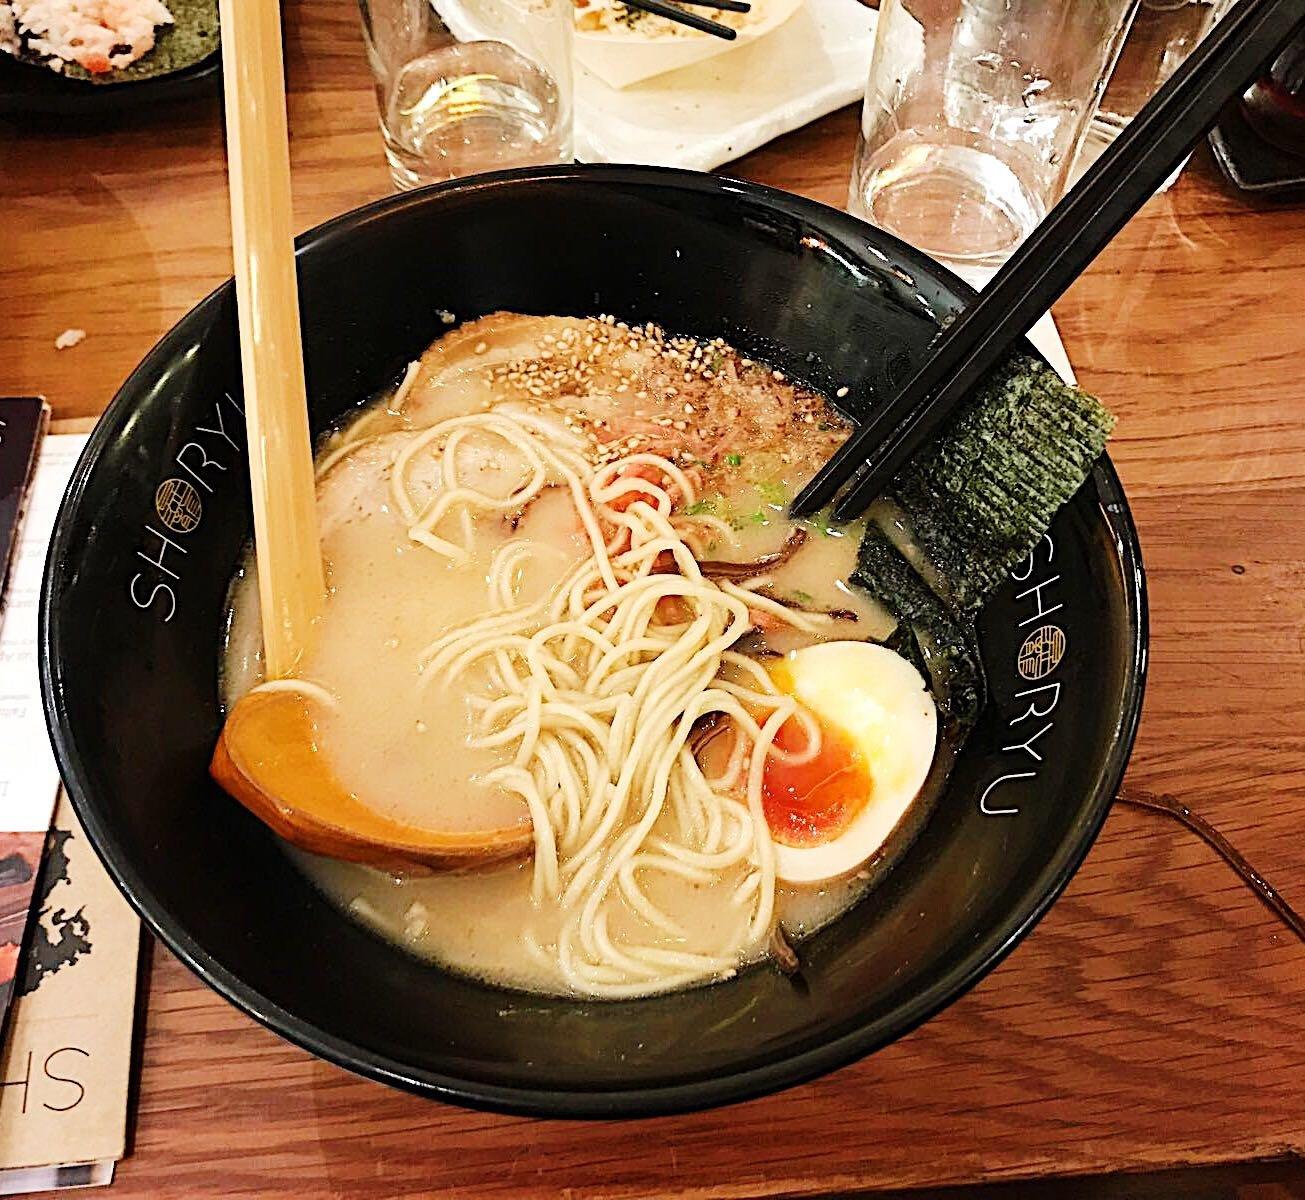 shoryu ristorante